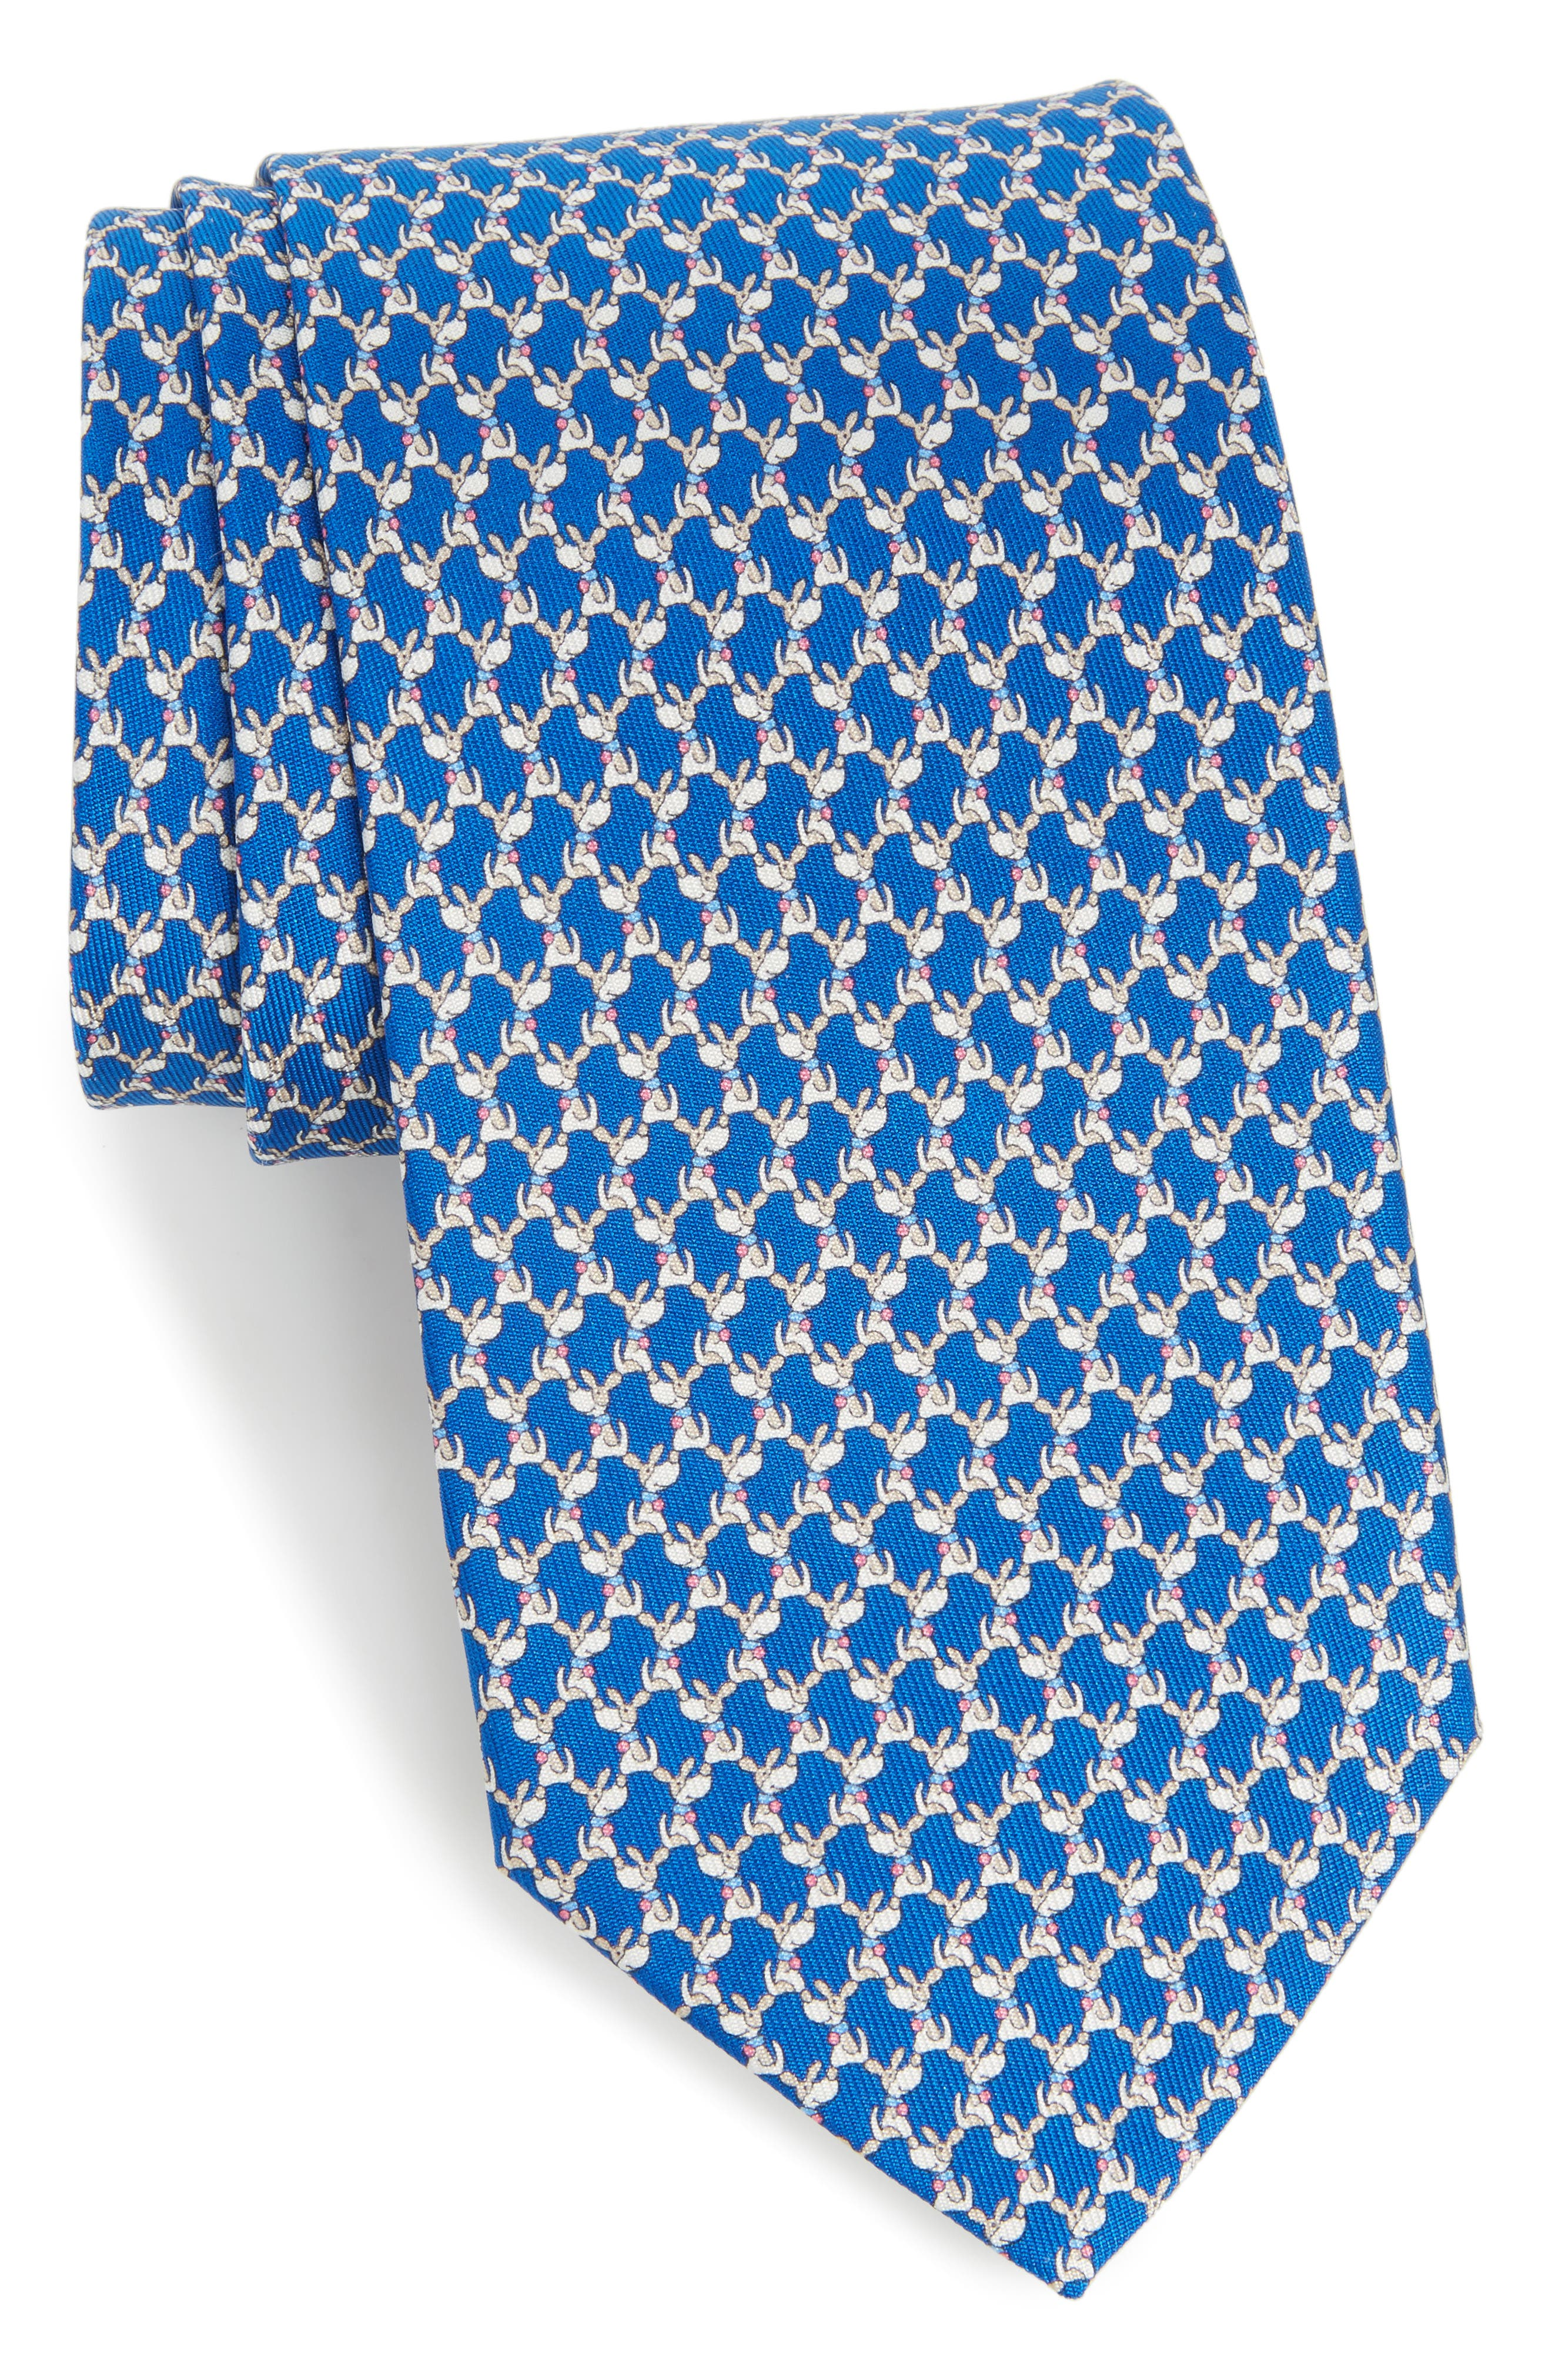 Salvatore Ferragamo Riccardo Dog Print Silk Tie